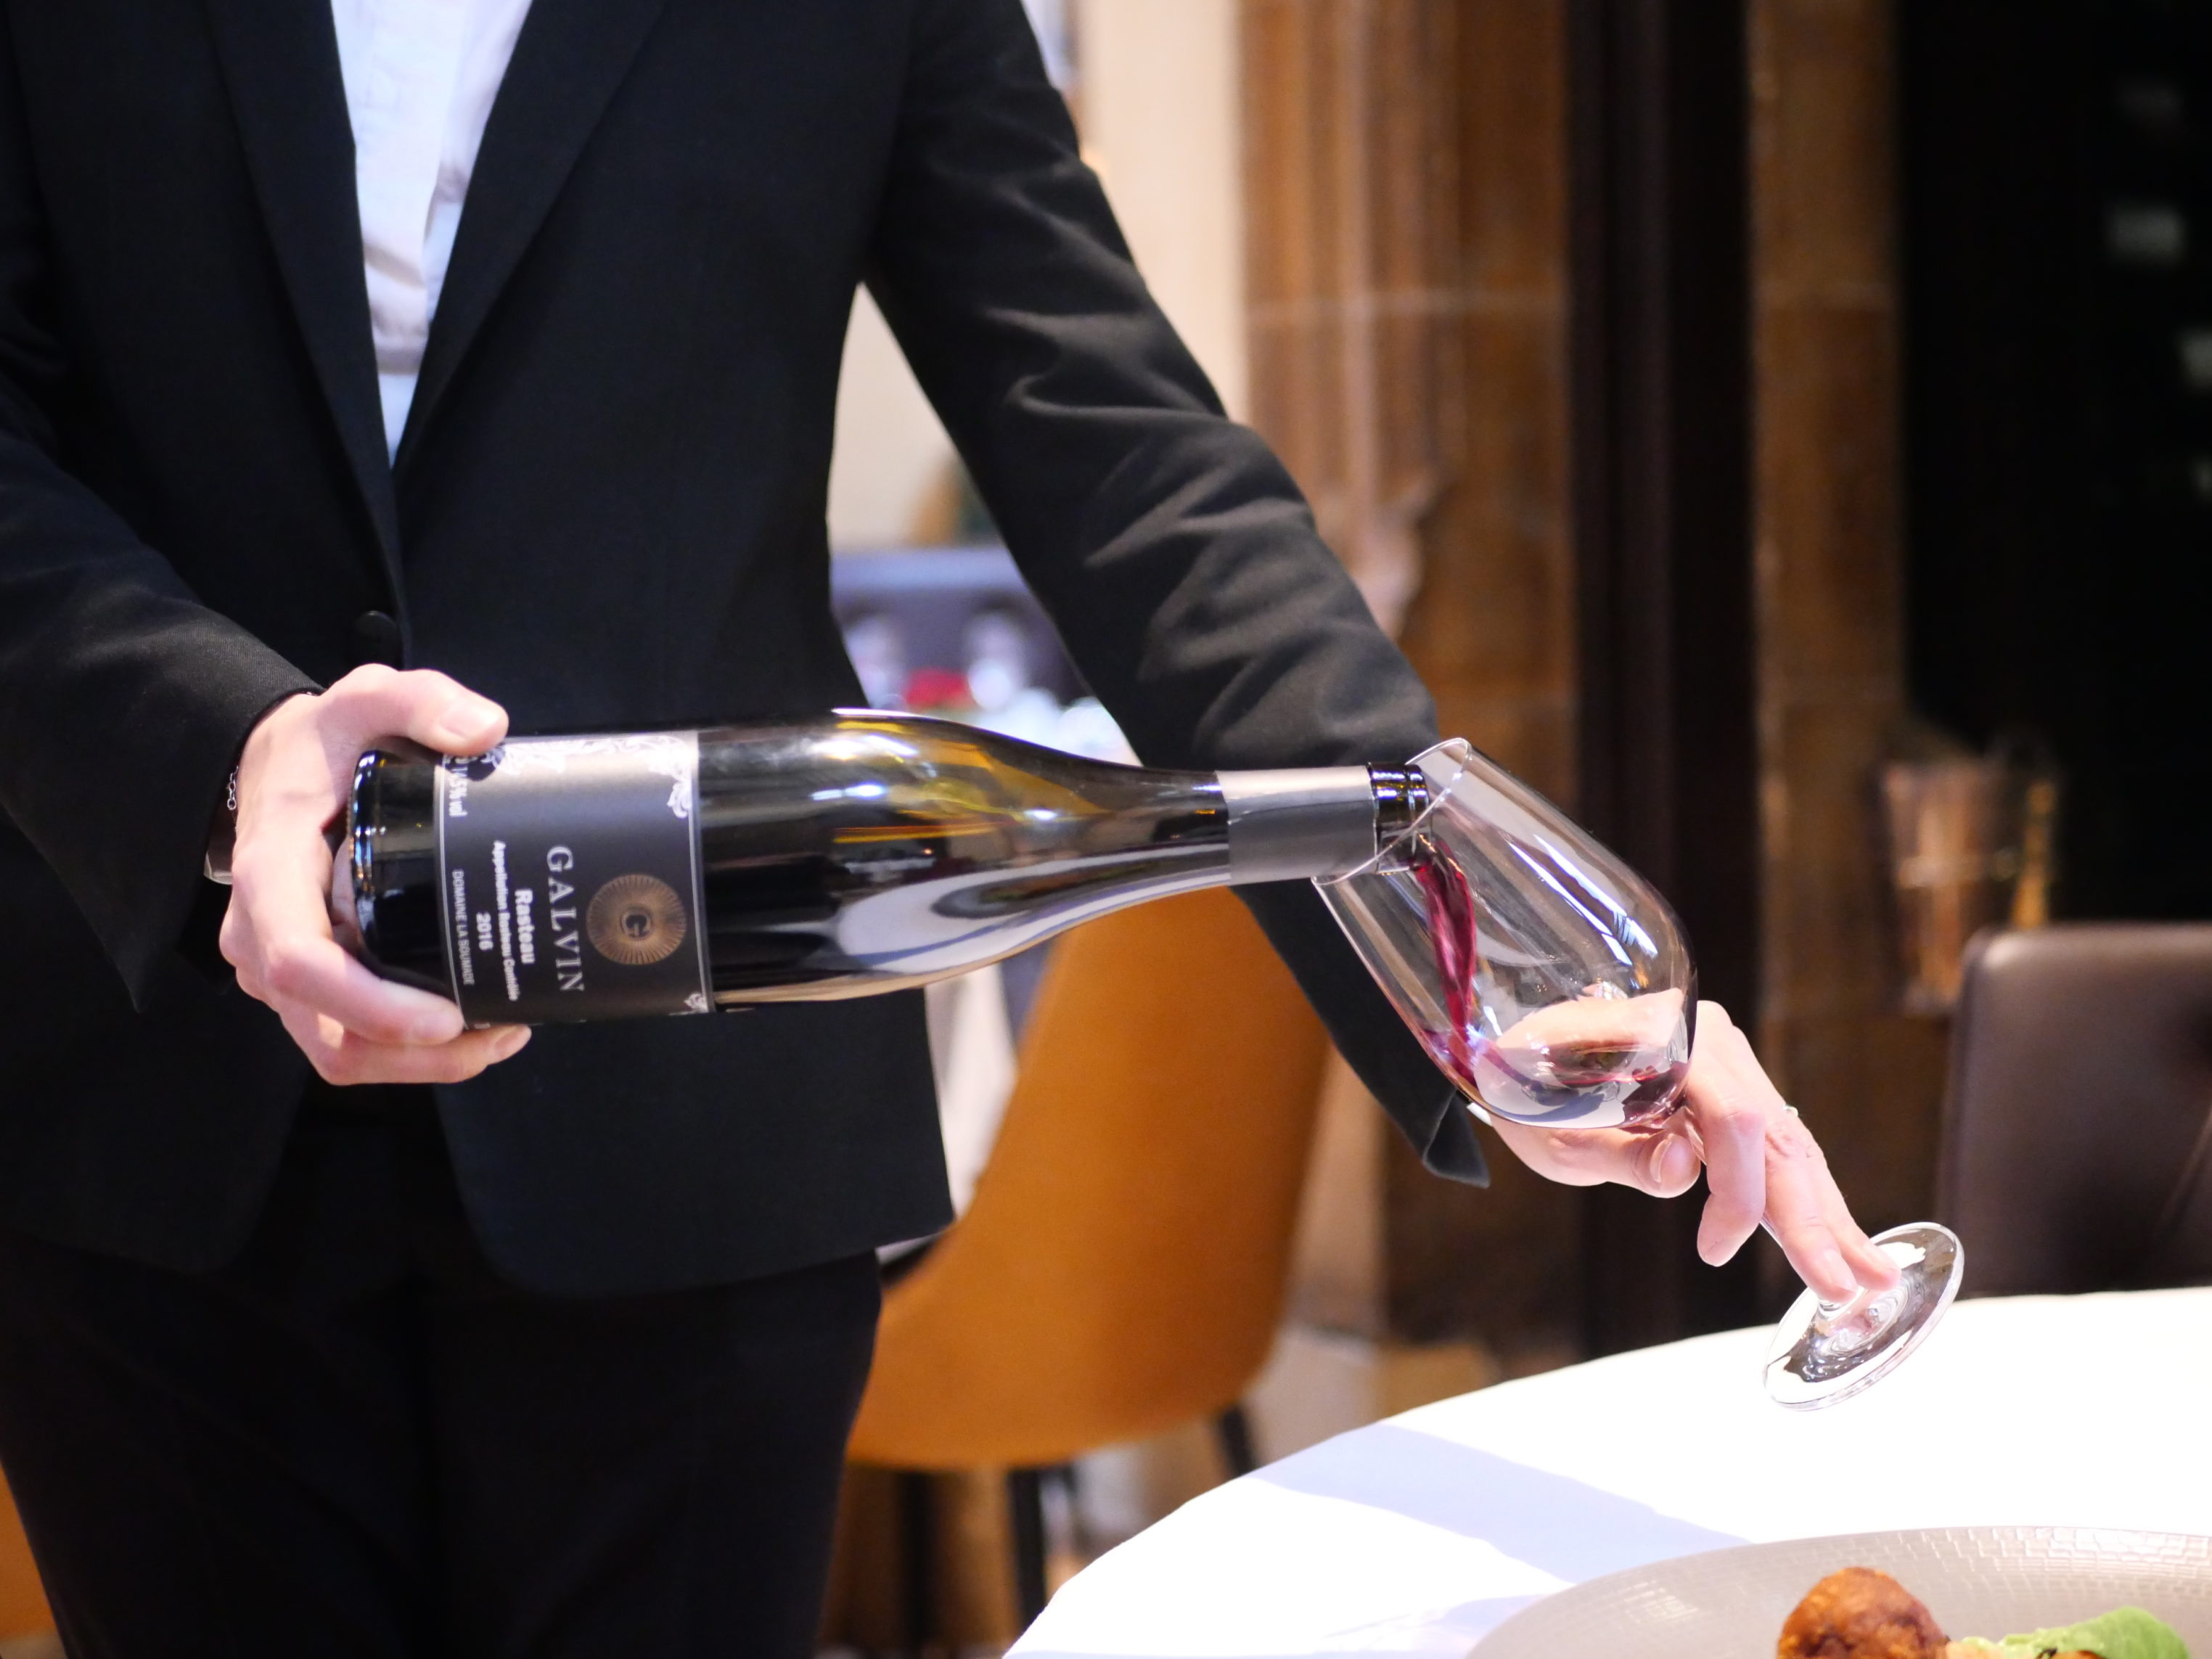 Galvin Restaurants - Wine pouring